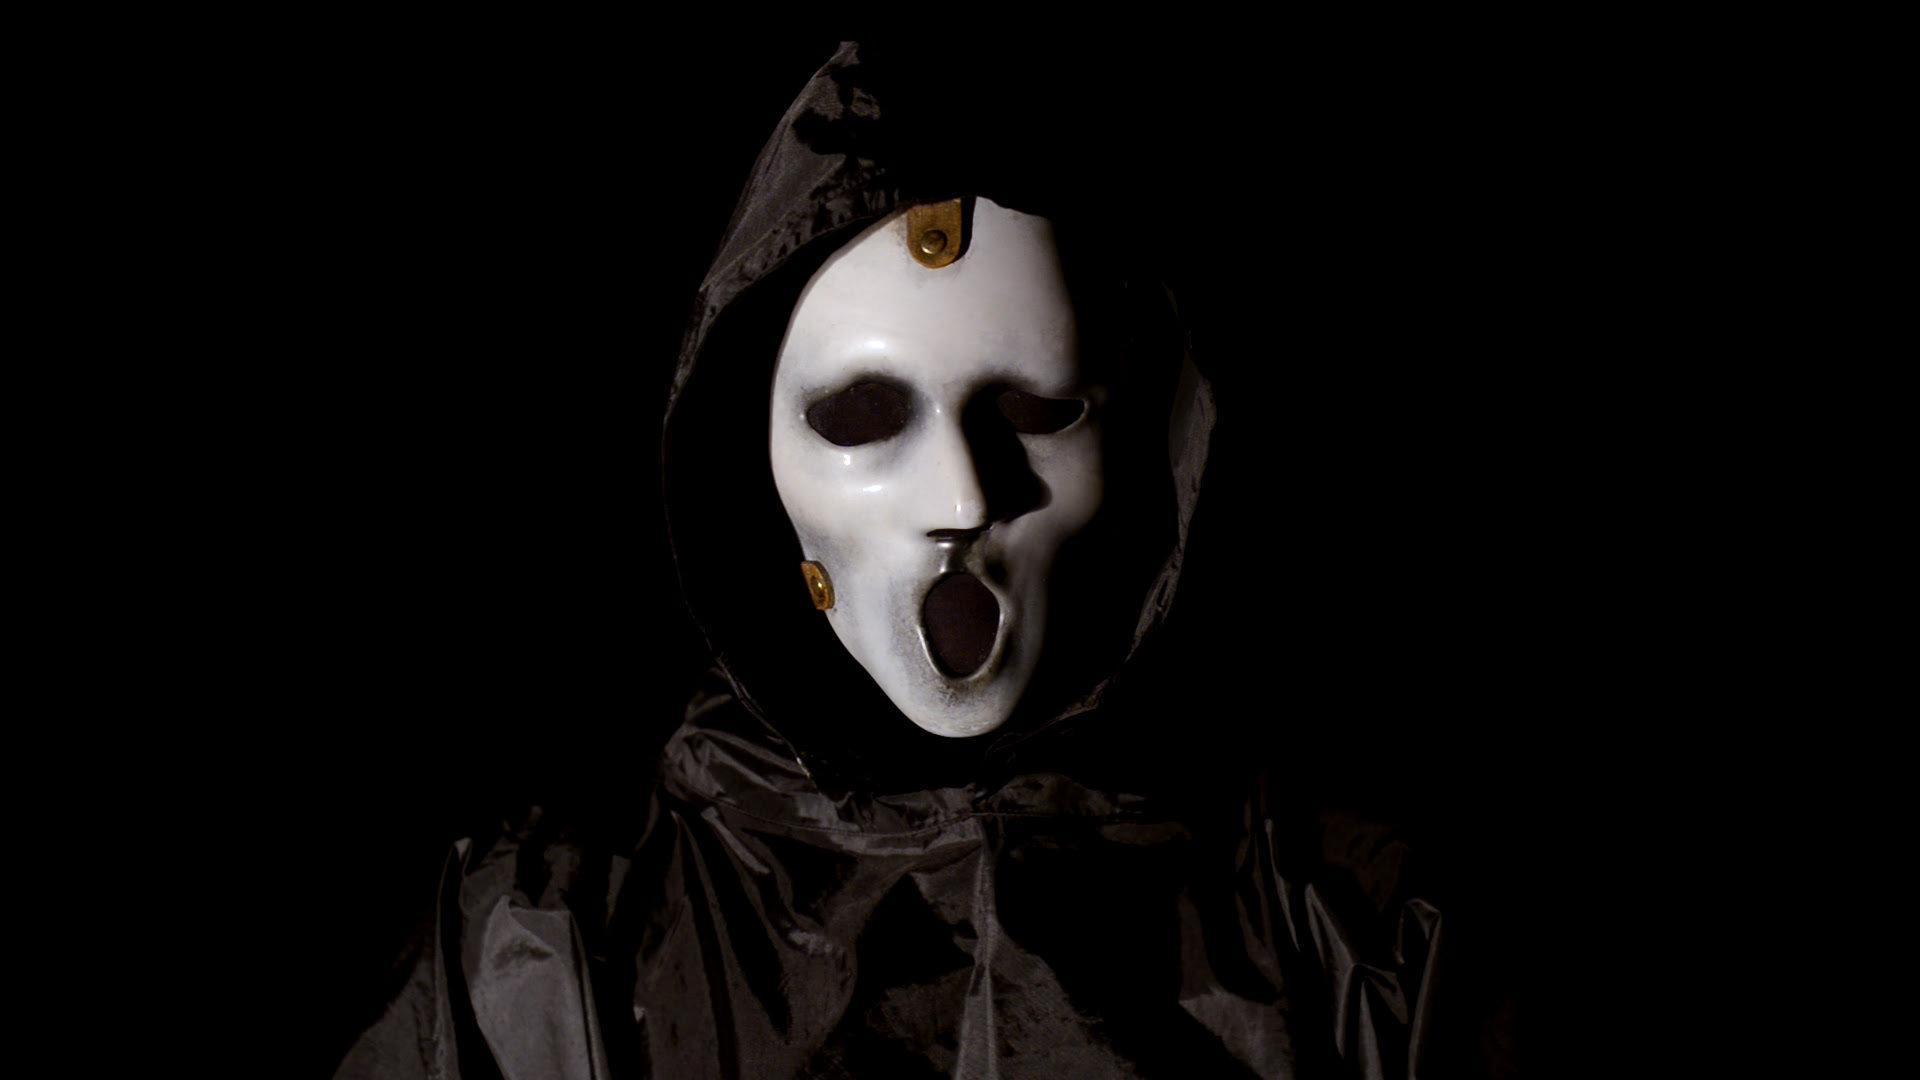 Scream The Tv Series Fondo De Pantalla Hd Fondo De